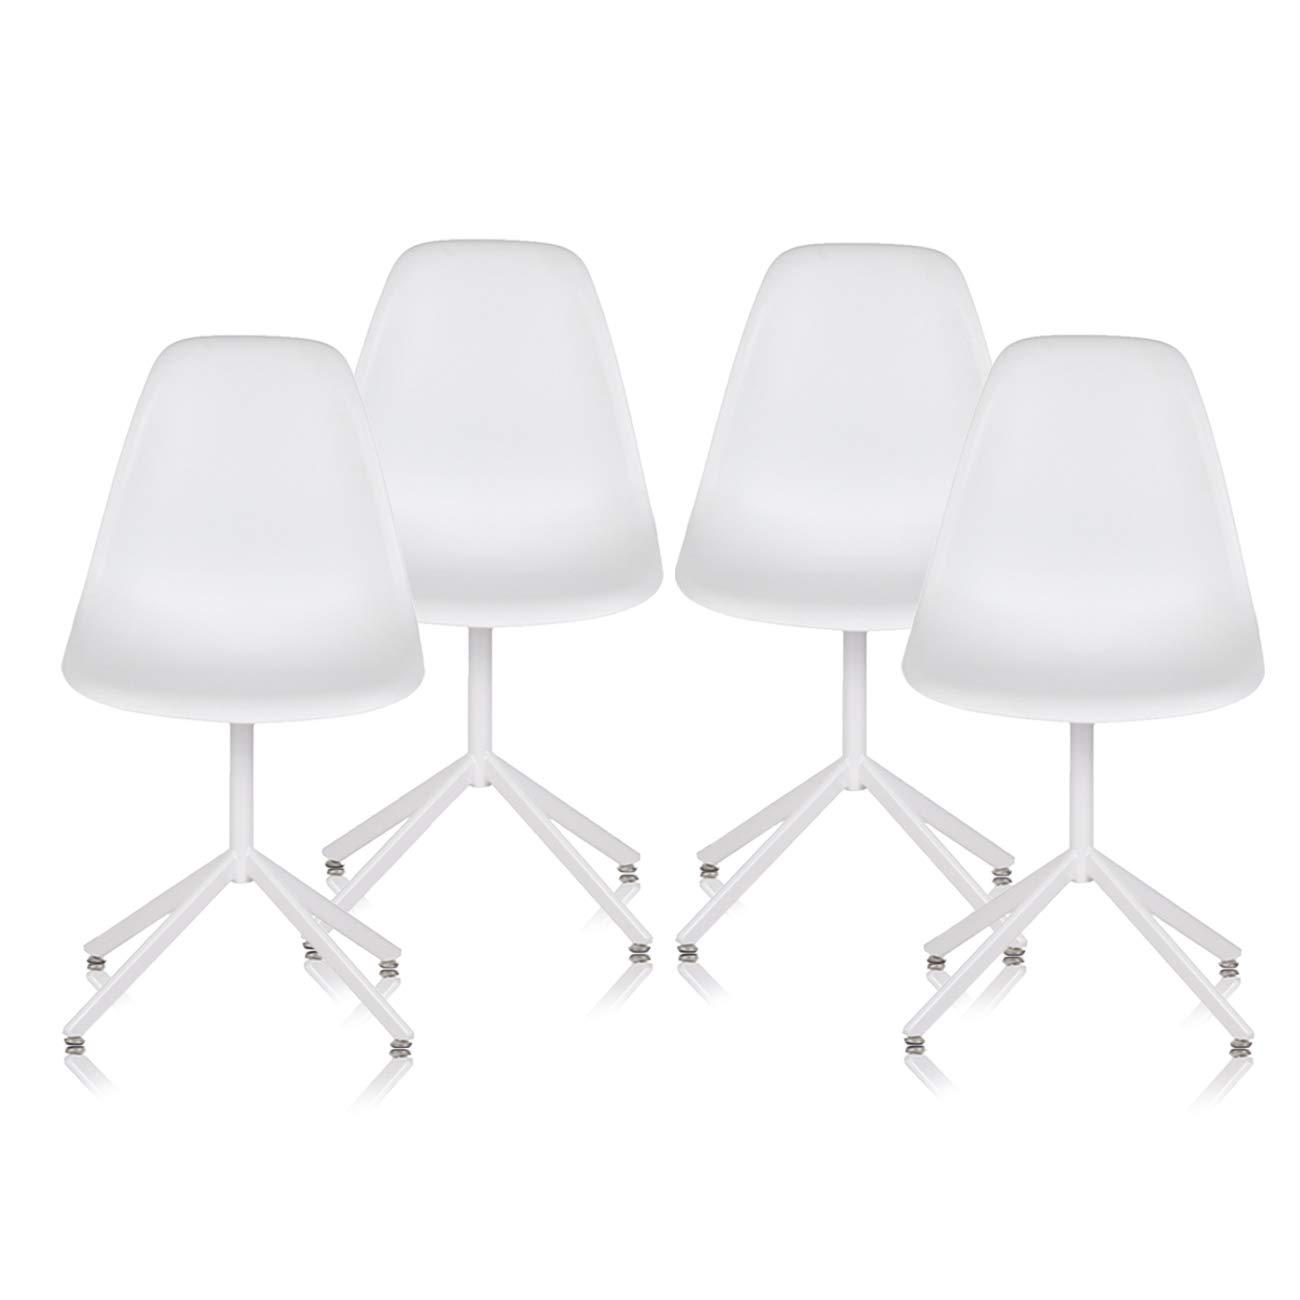 Design Stuhl Retro Stuhl Esszimmerstuhl Sitzgruppe Bürostuhl 4 Set Büro MY SIT